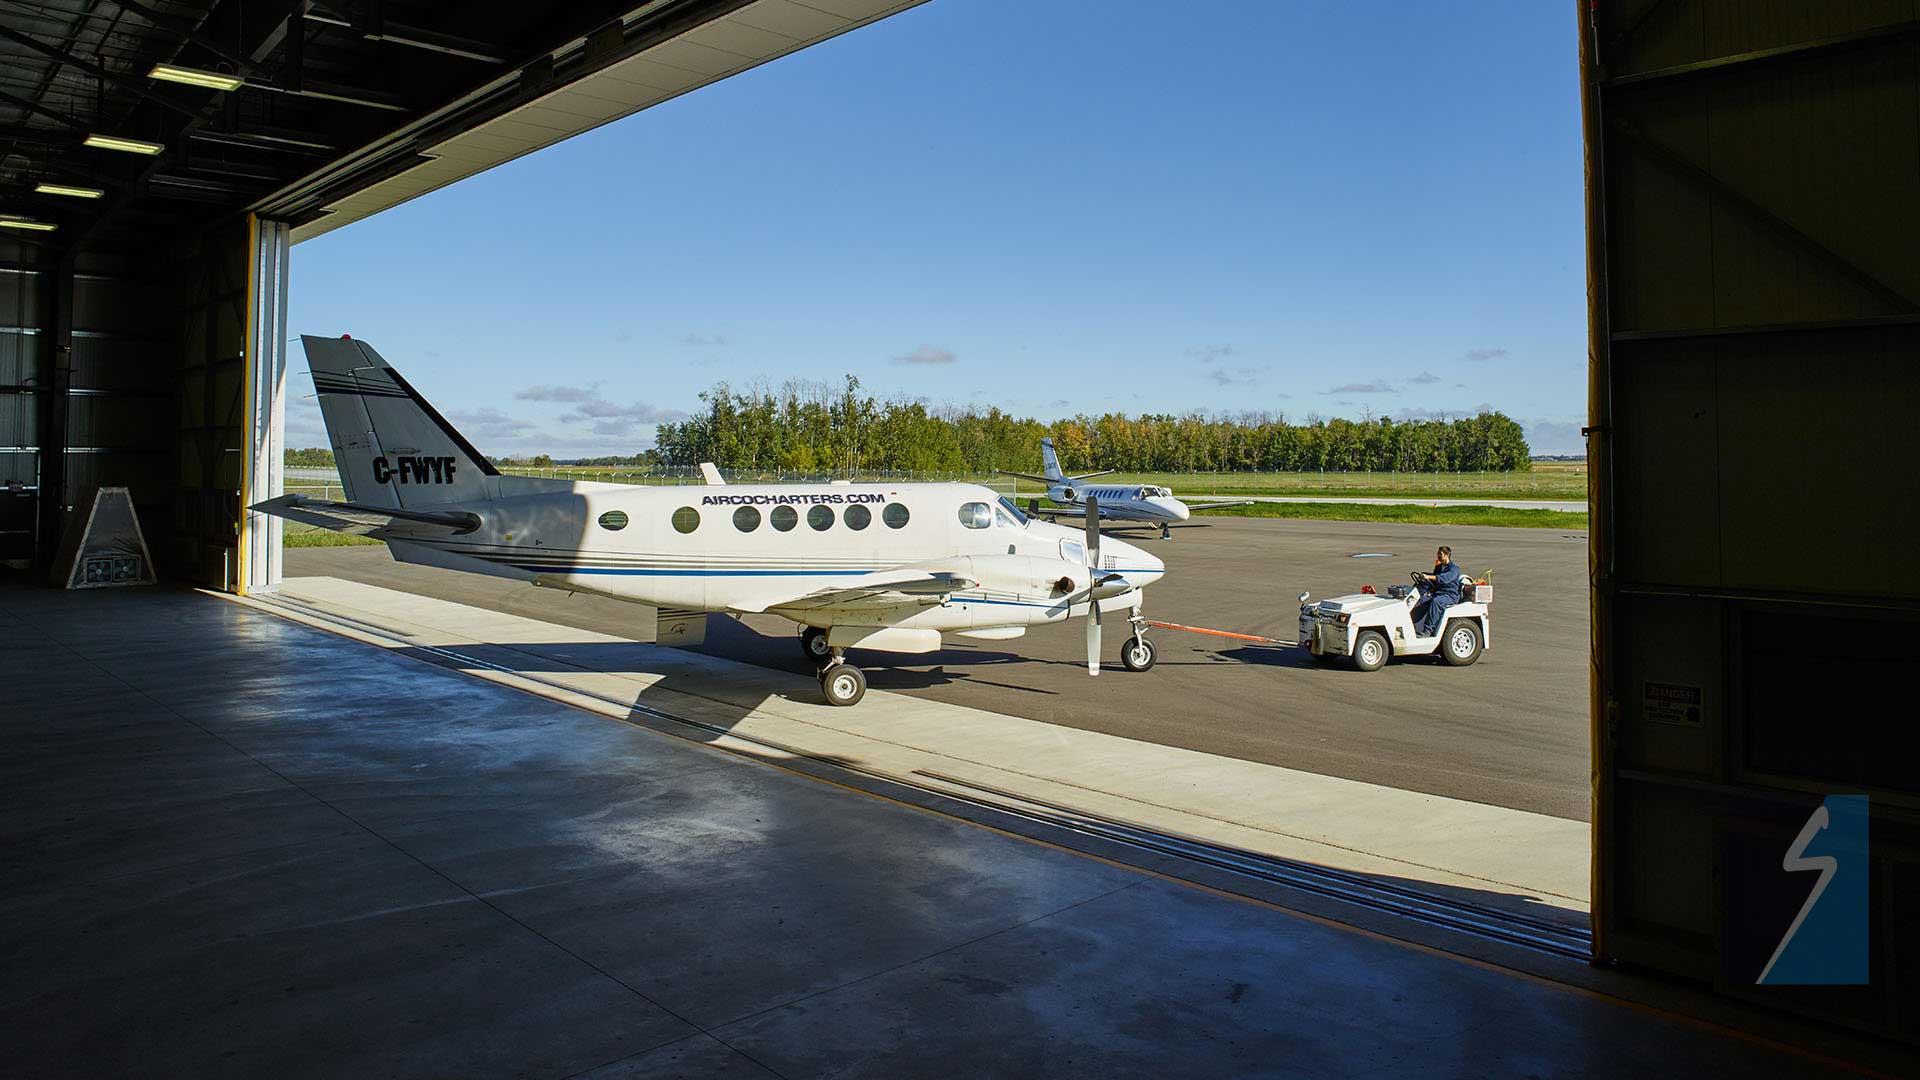 SBP-Airco-JD1315-ACI-Airco-65